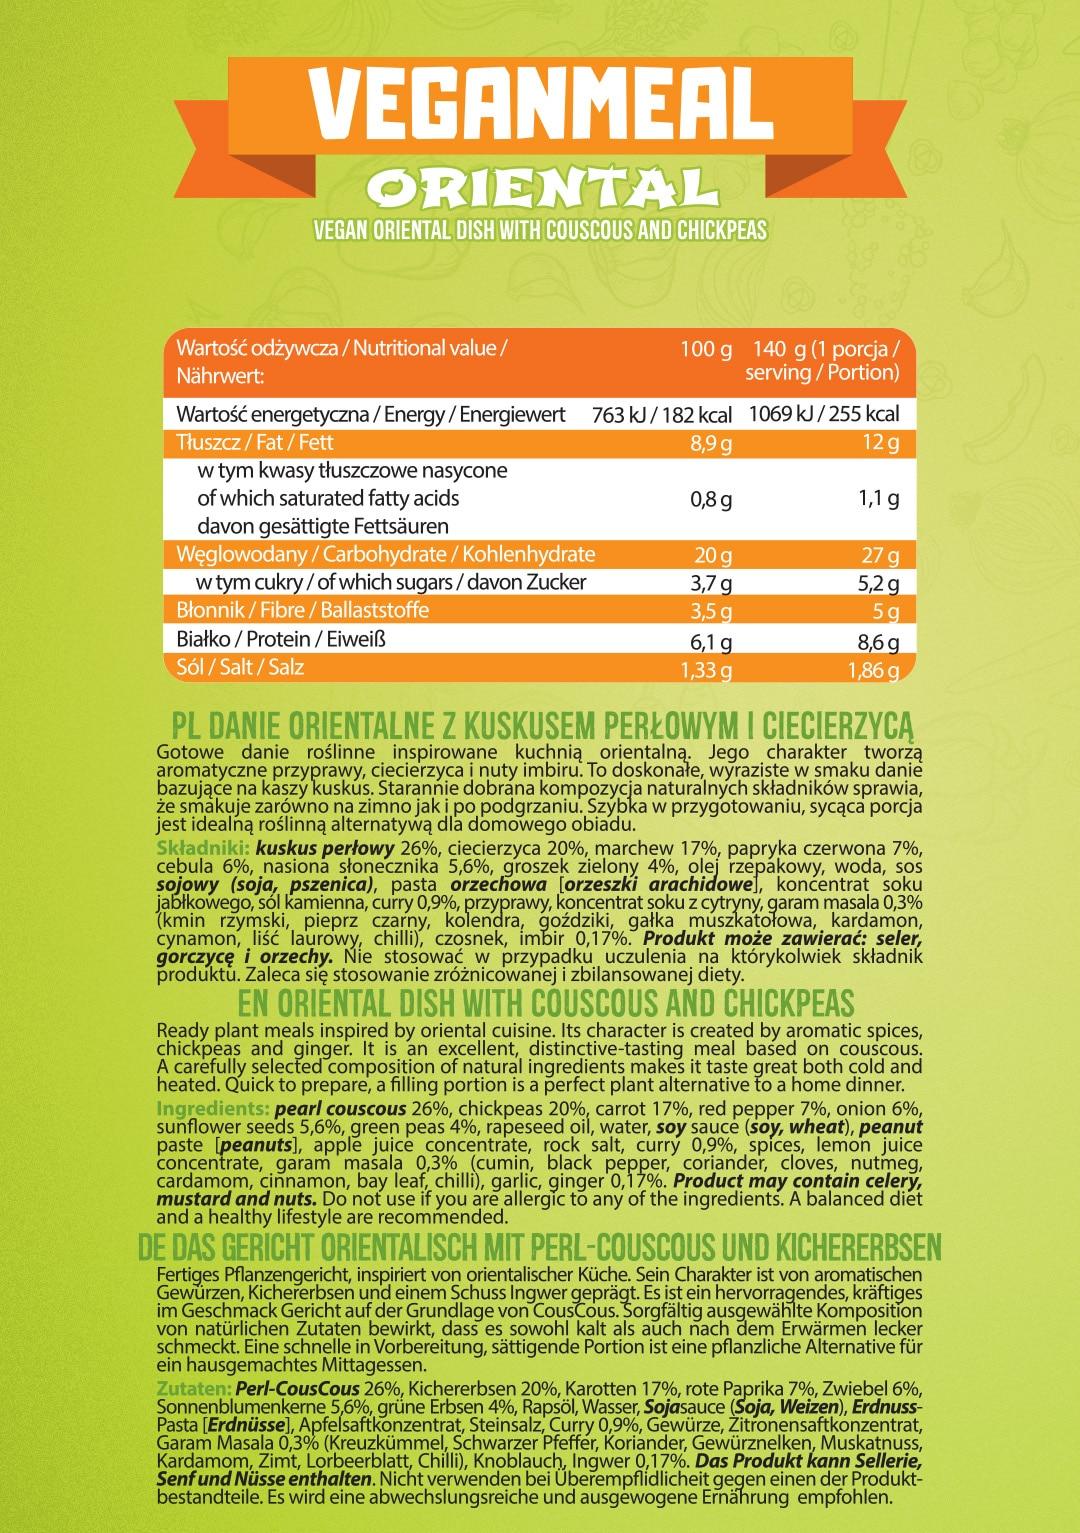 vegan-meal-oriental-allnutrition